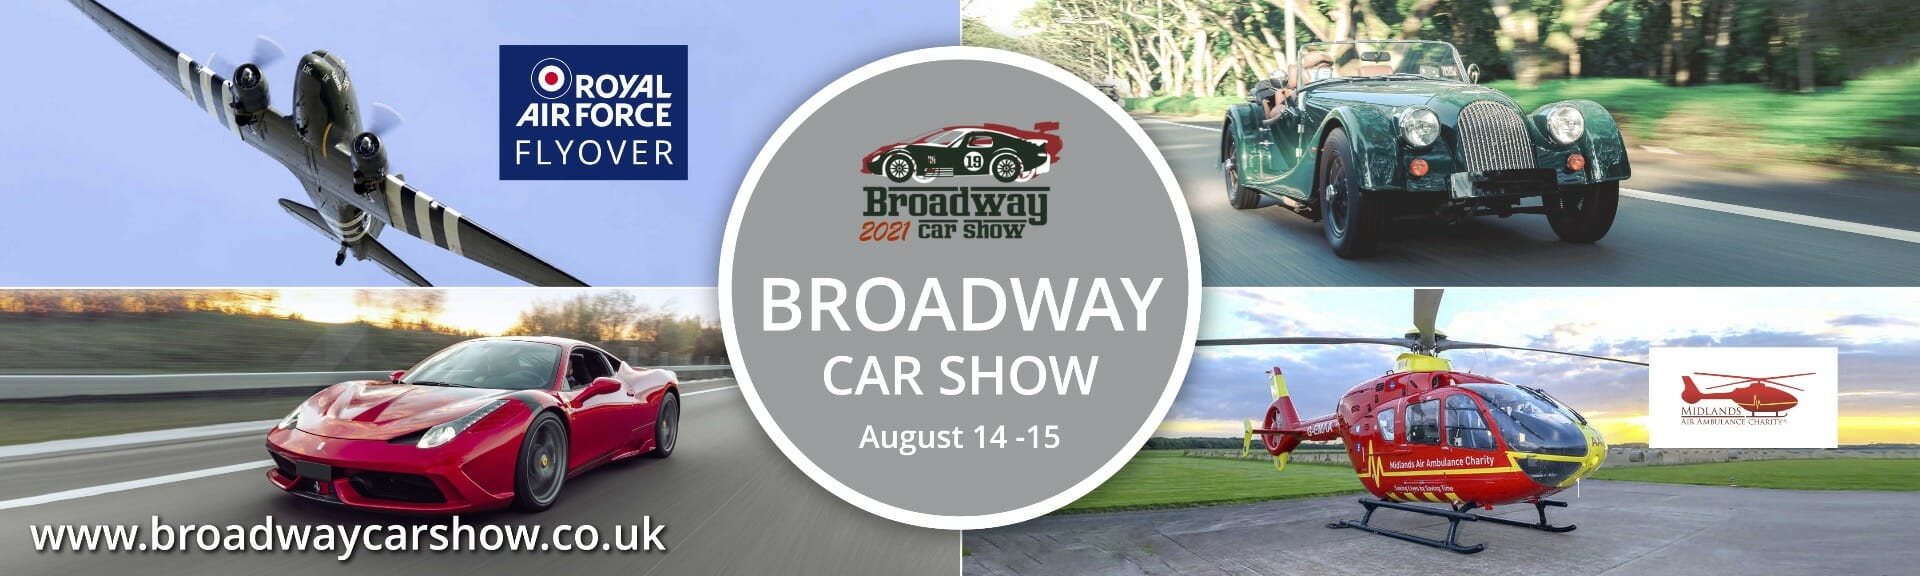 Broadway Car Show